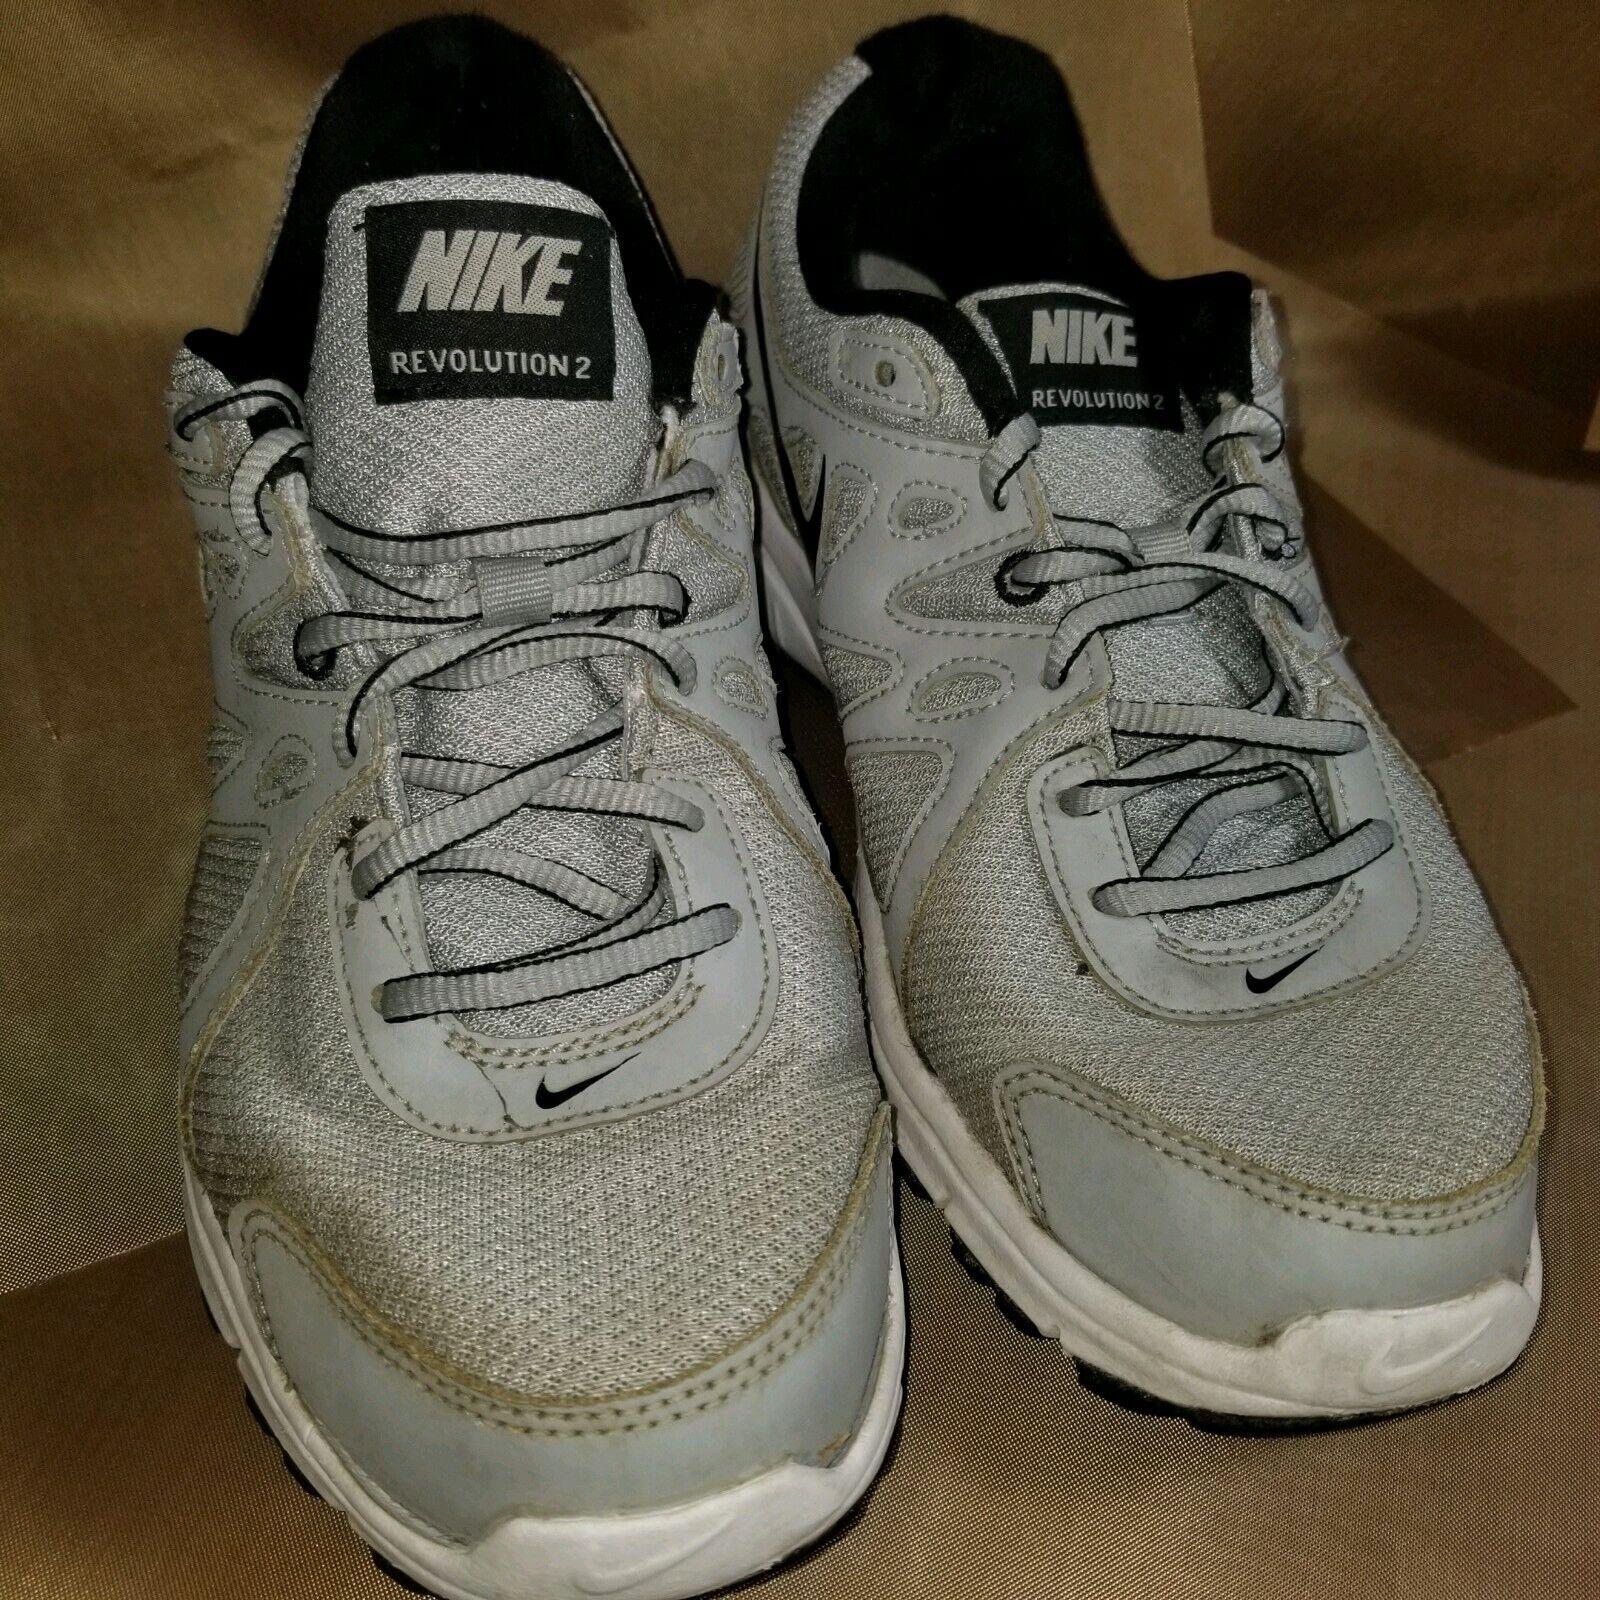 Nike Revolution 2 Size US 9 (D) EU 42.5